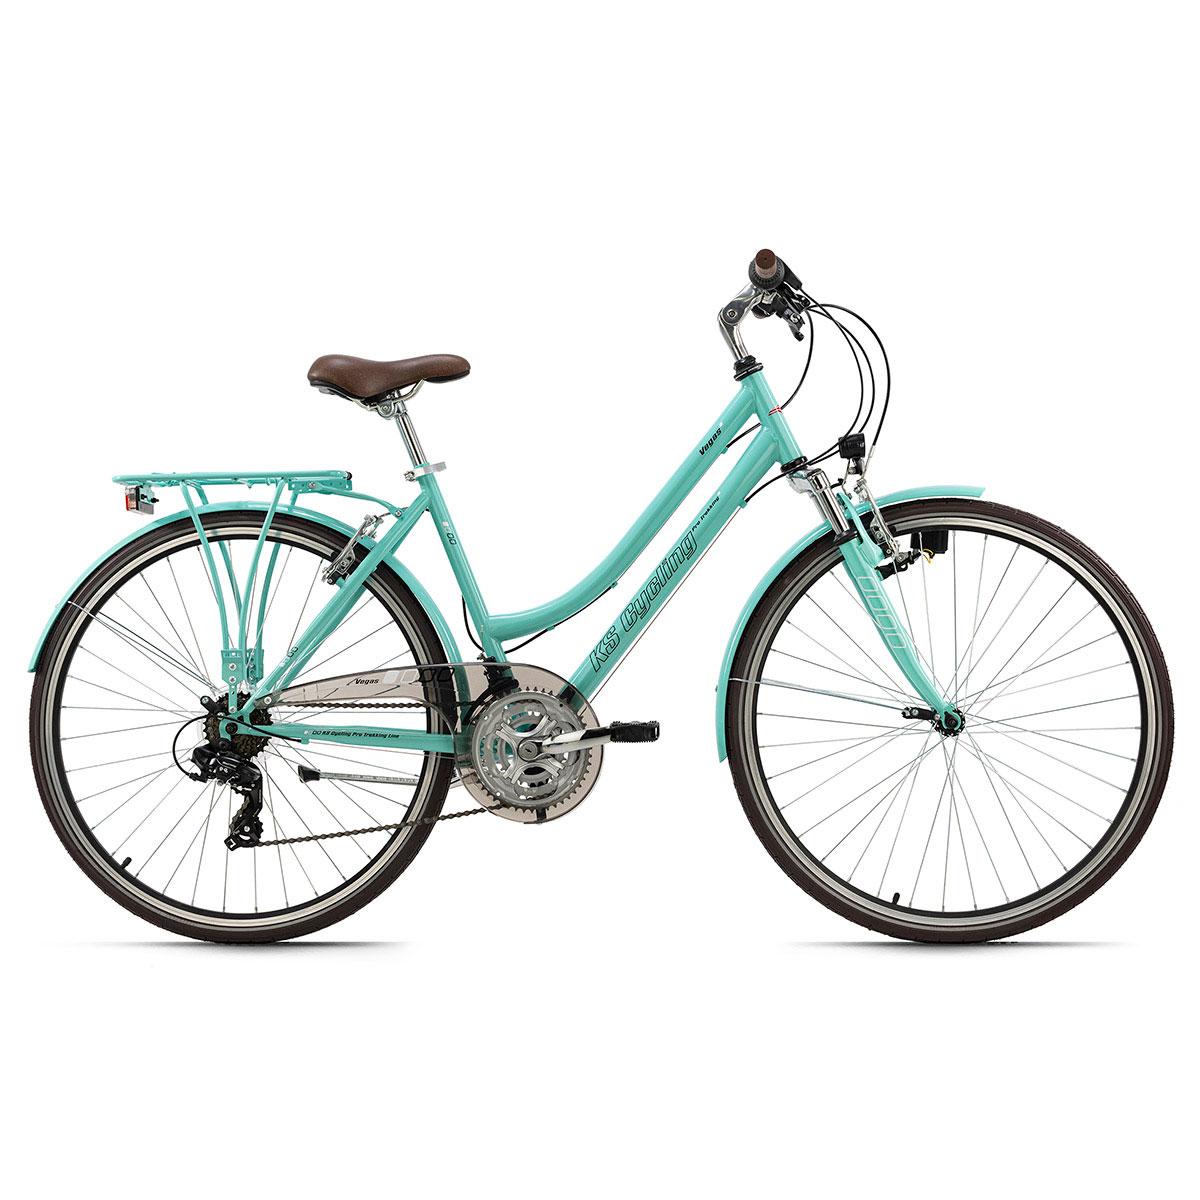 "Trekkingrad ""Vegas"", Damen, Flachlenker, 48cm, grün Flachlenker | Damen | gruen | 48 cm"